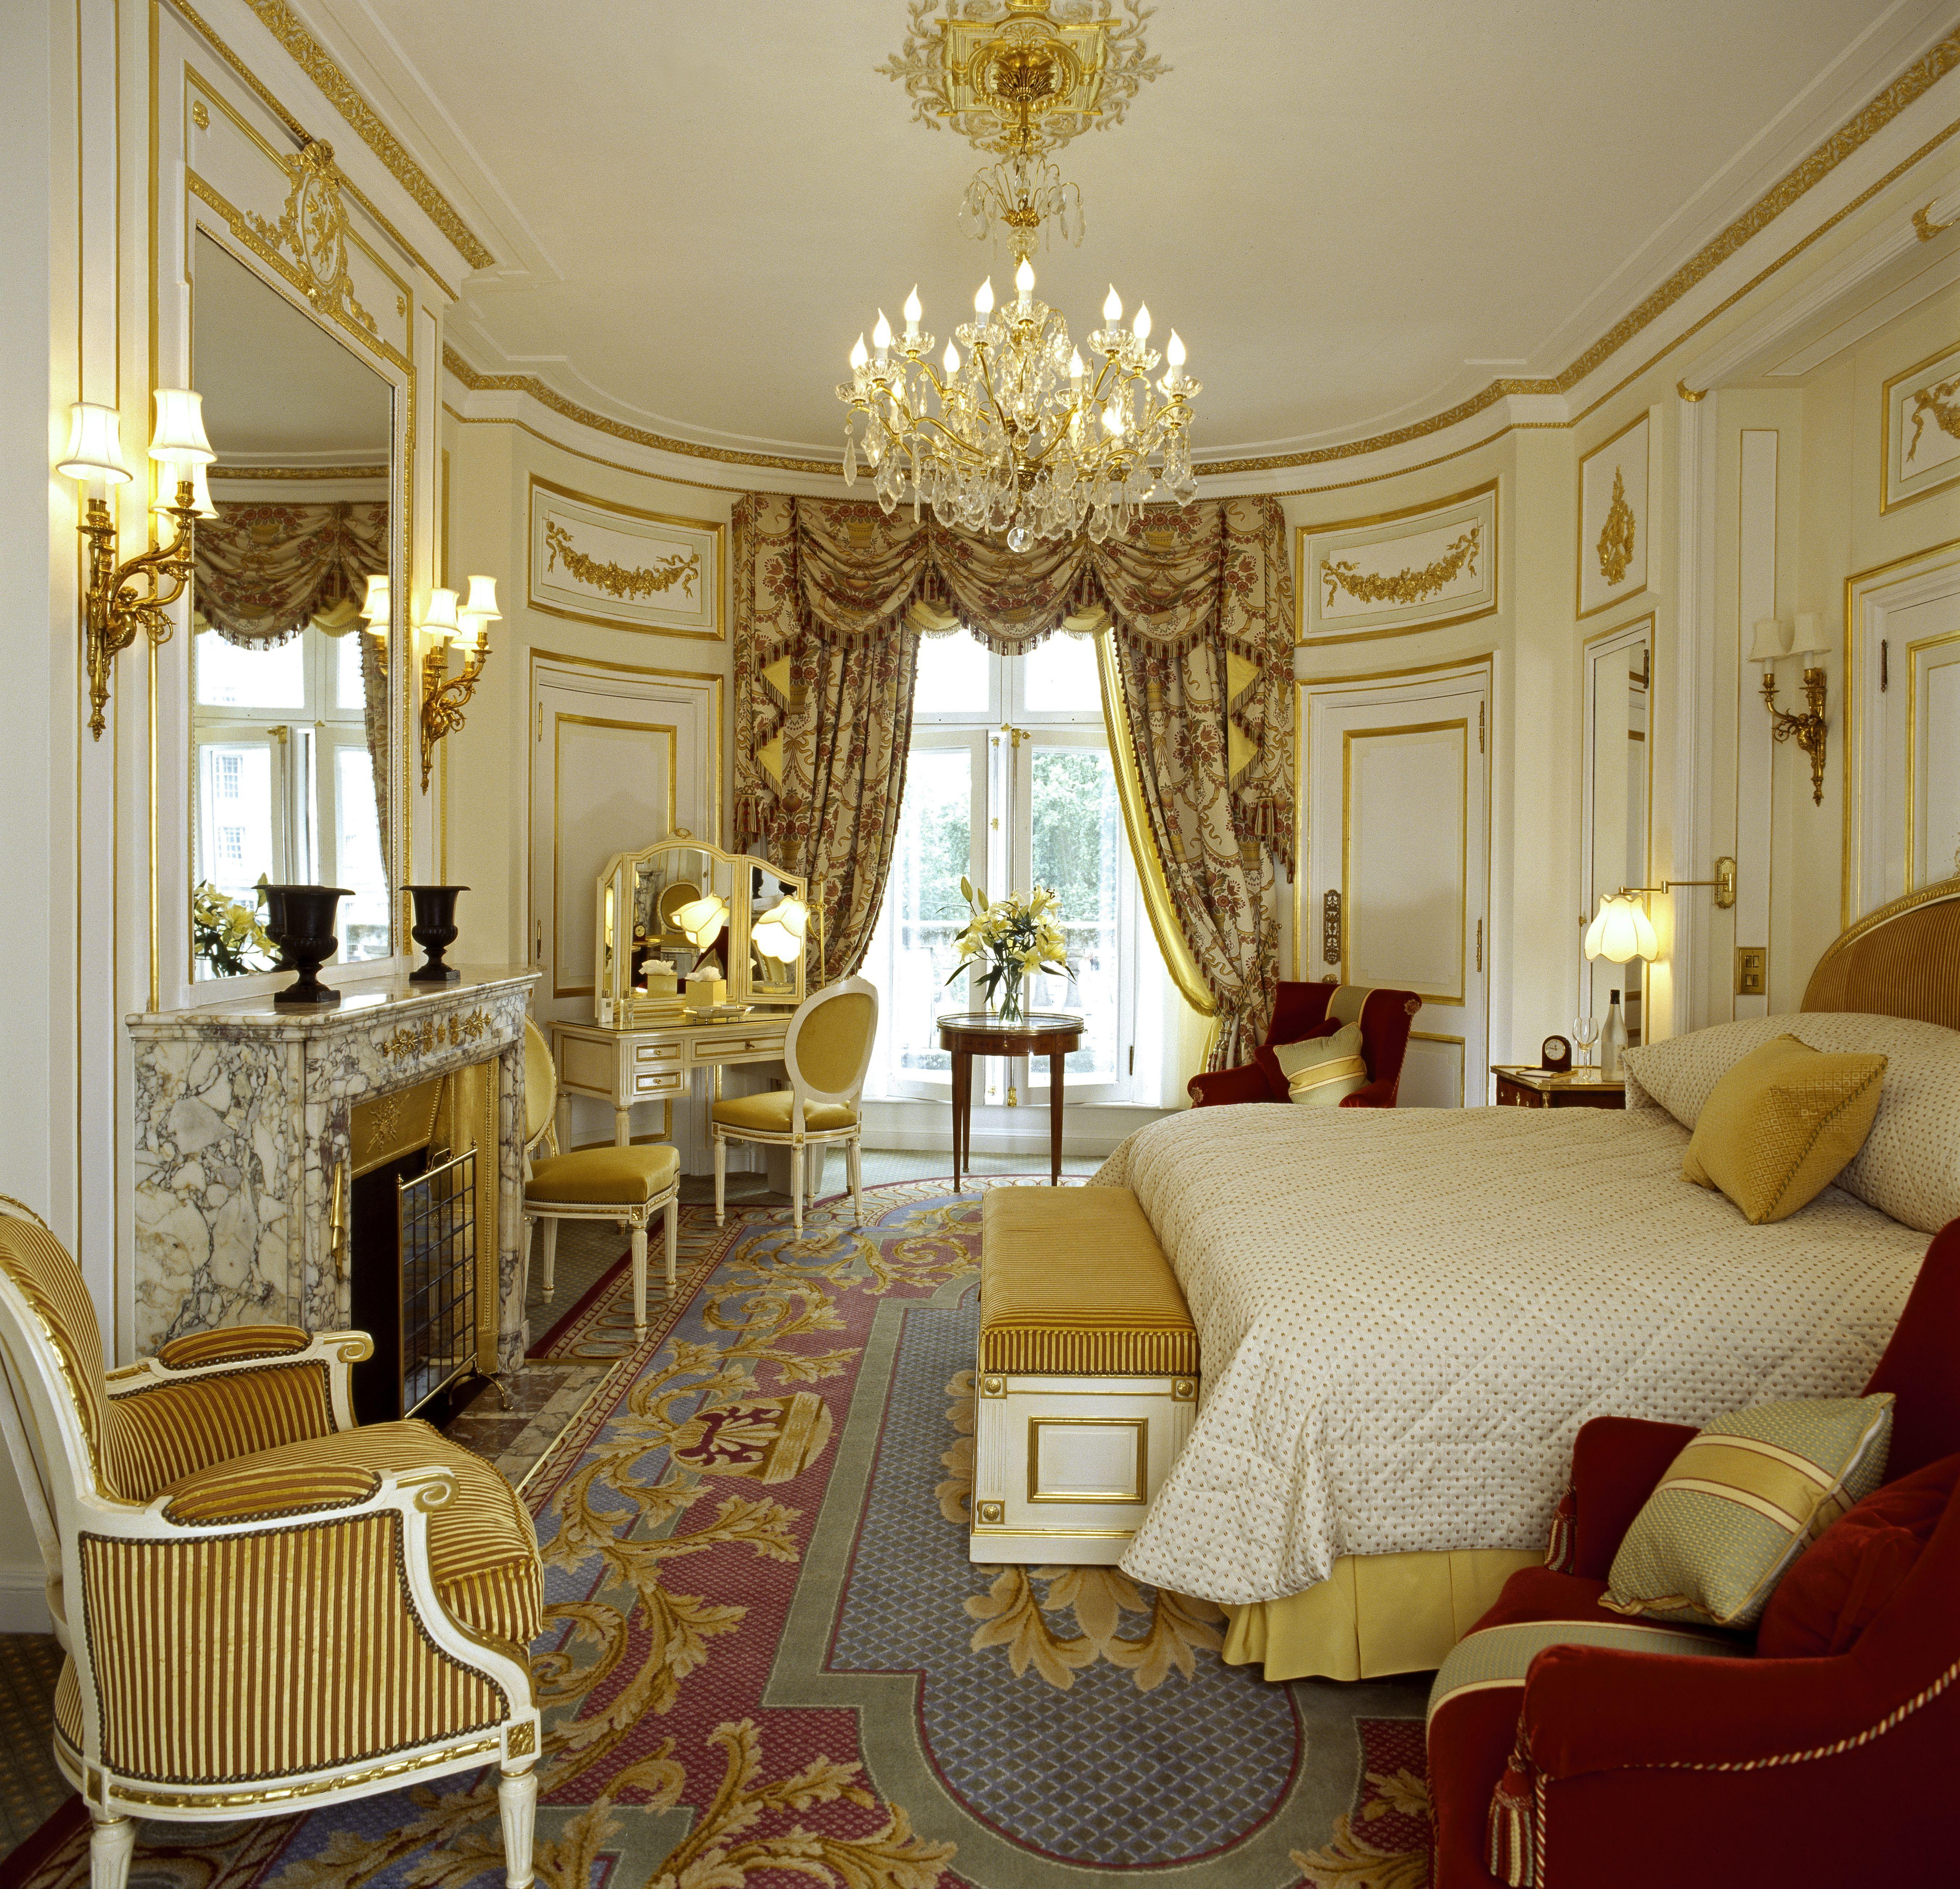 The Trafalgar Suite Bedroom